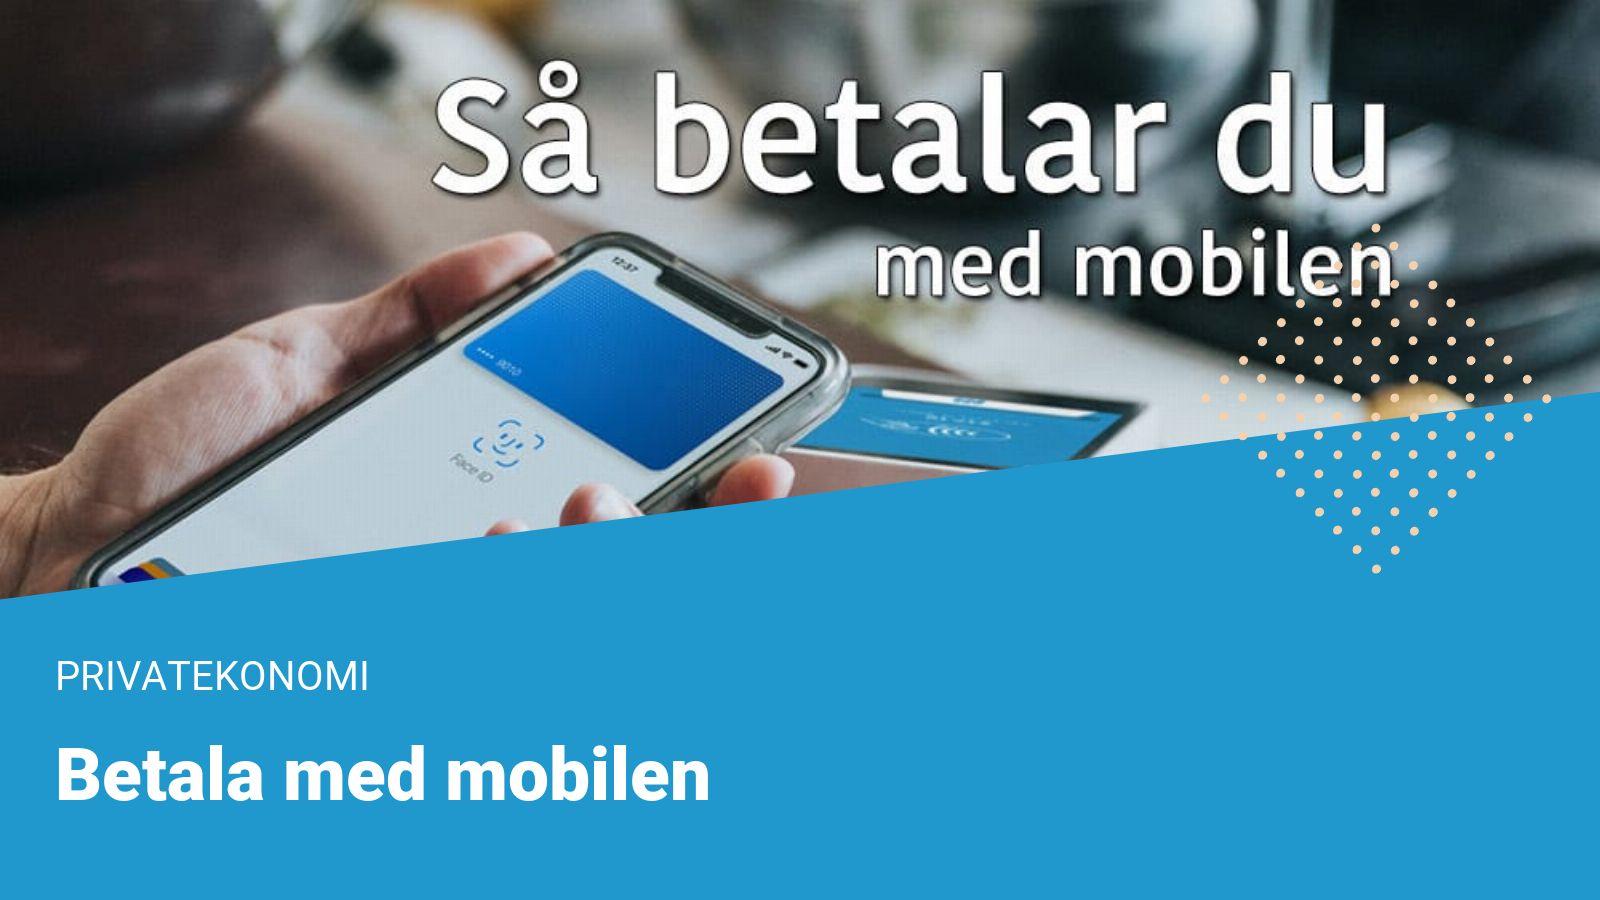 Så betalar du med mobilen